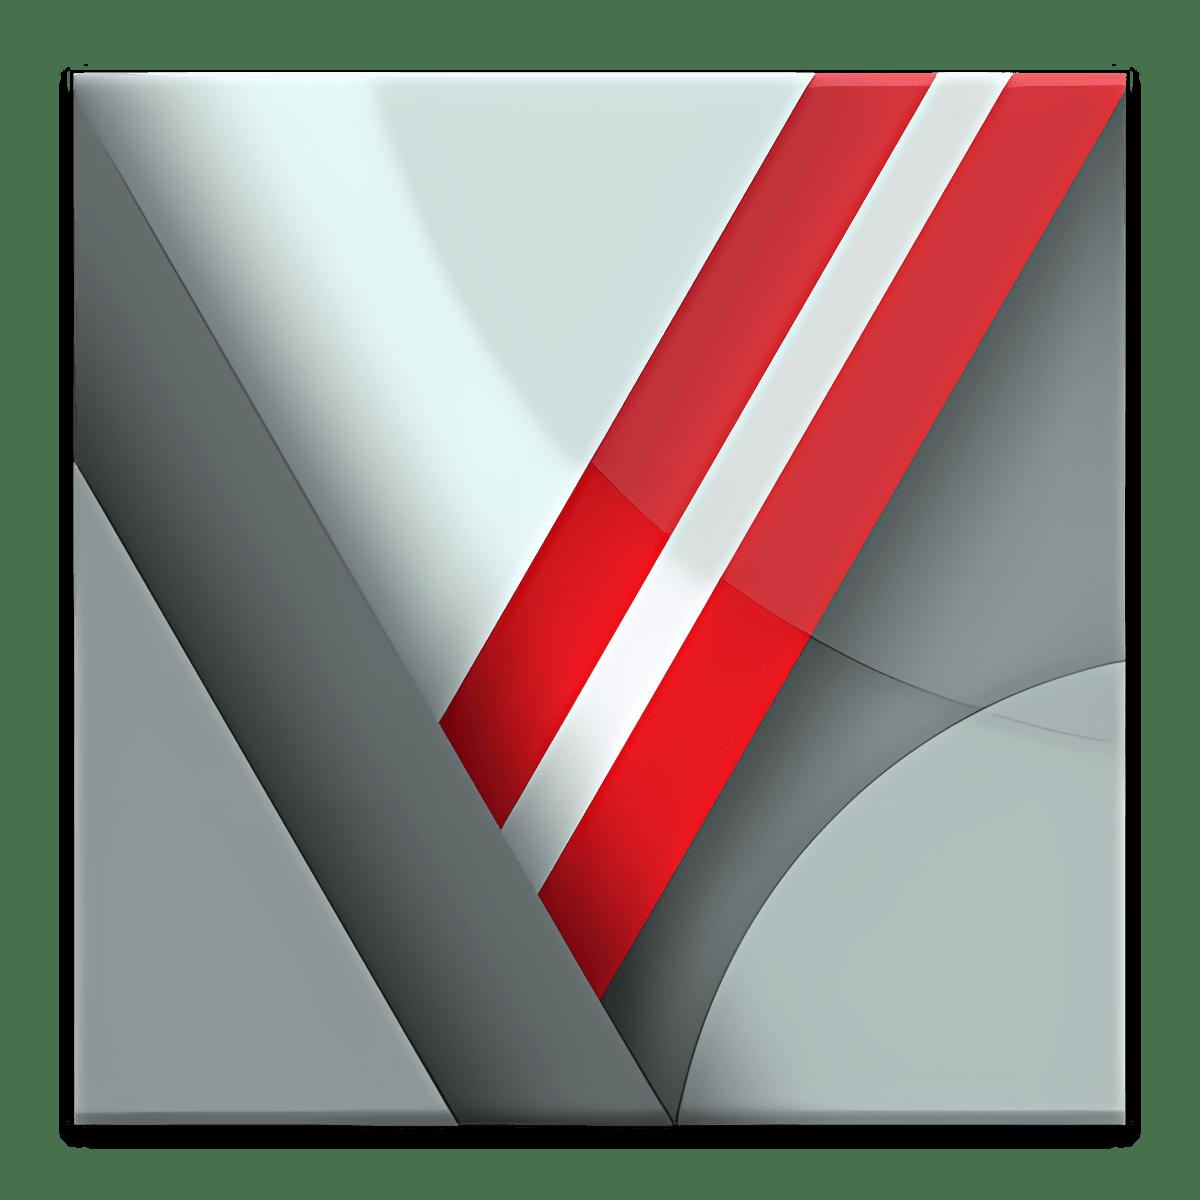 Minima Pro Live Wallpaper 3.1.1